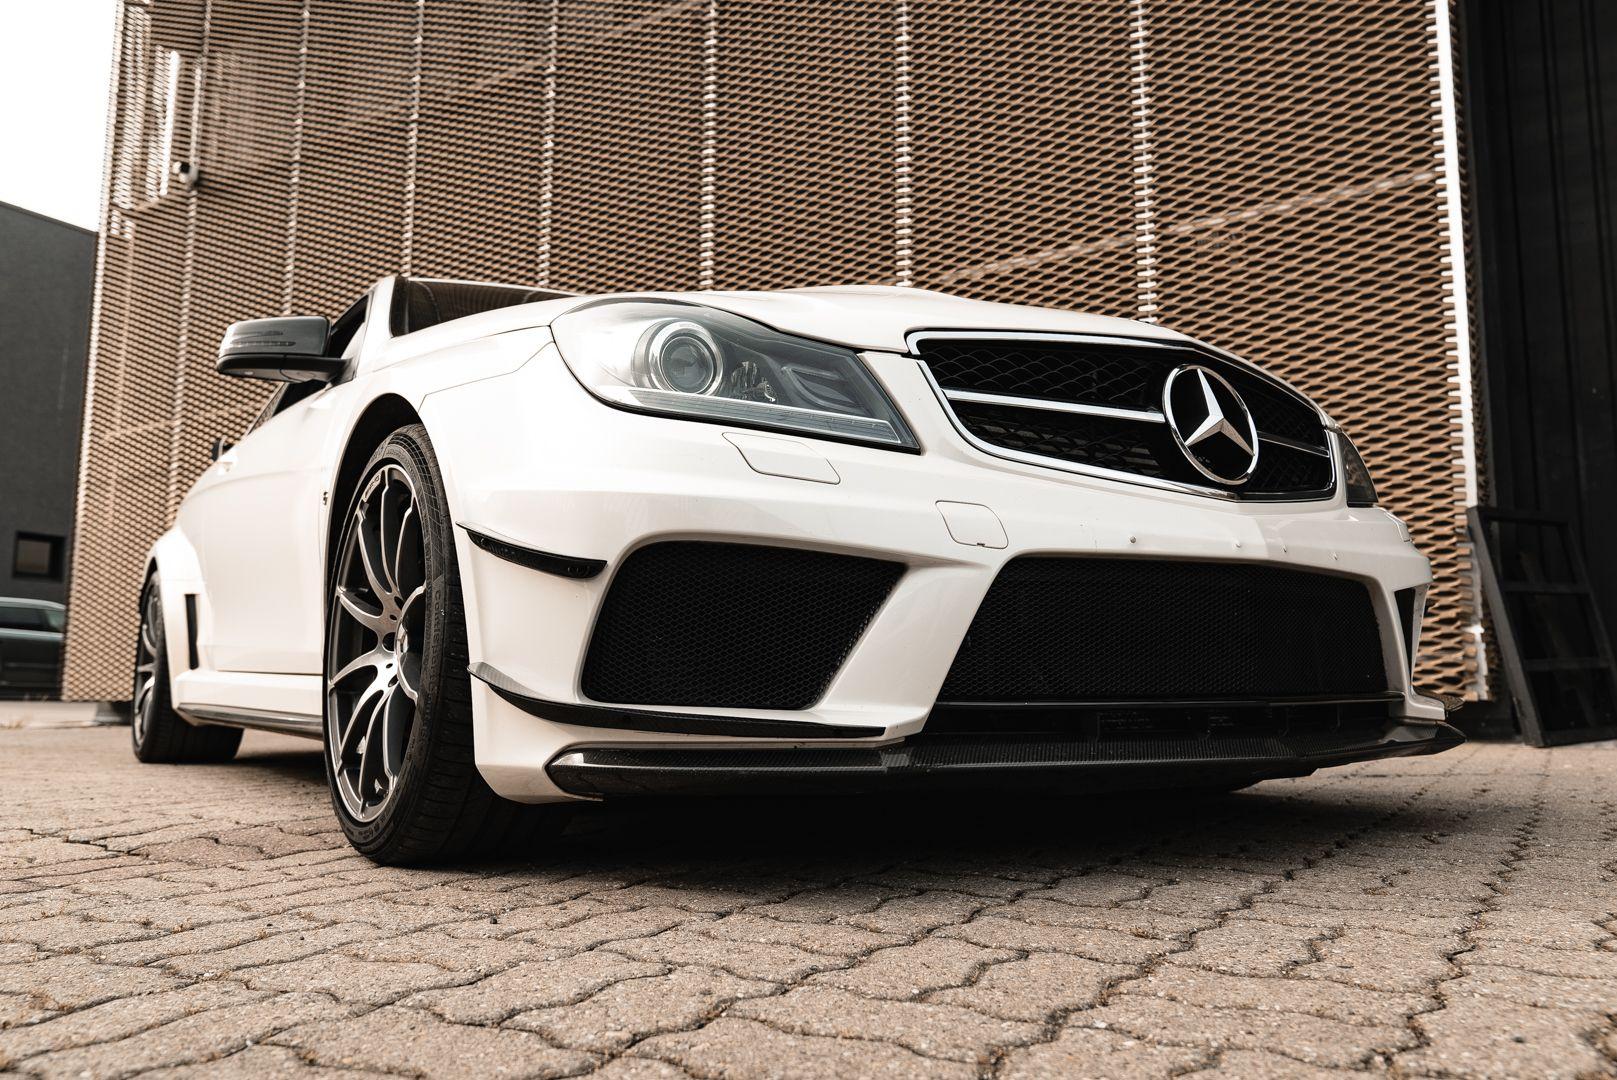 2012 Mercedes-Benz C63 AMG Black Series 71761